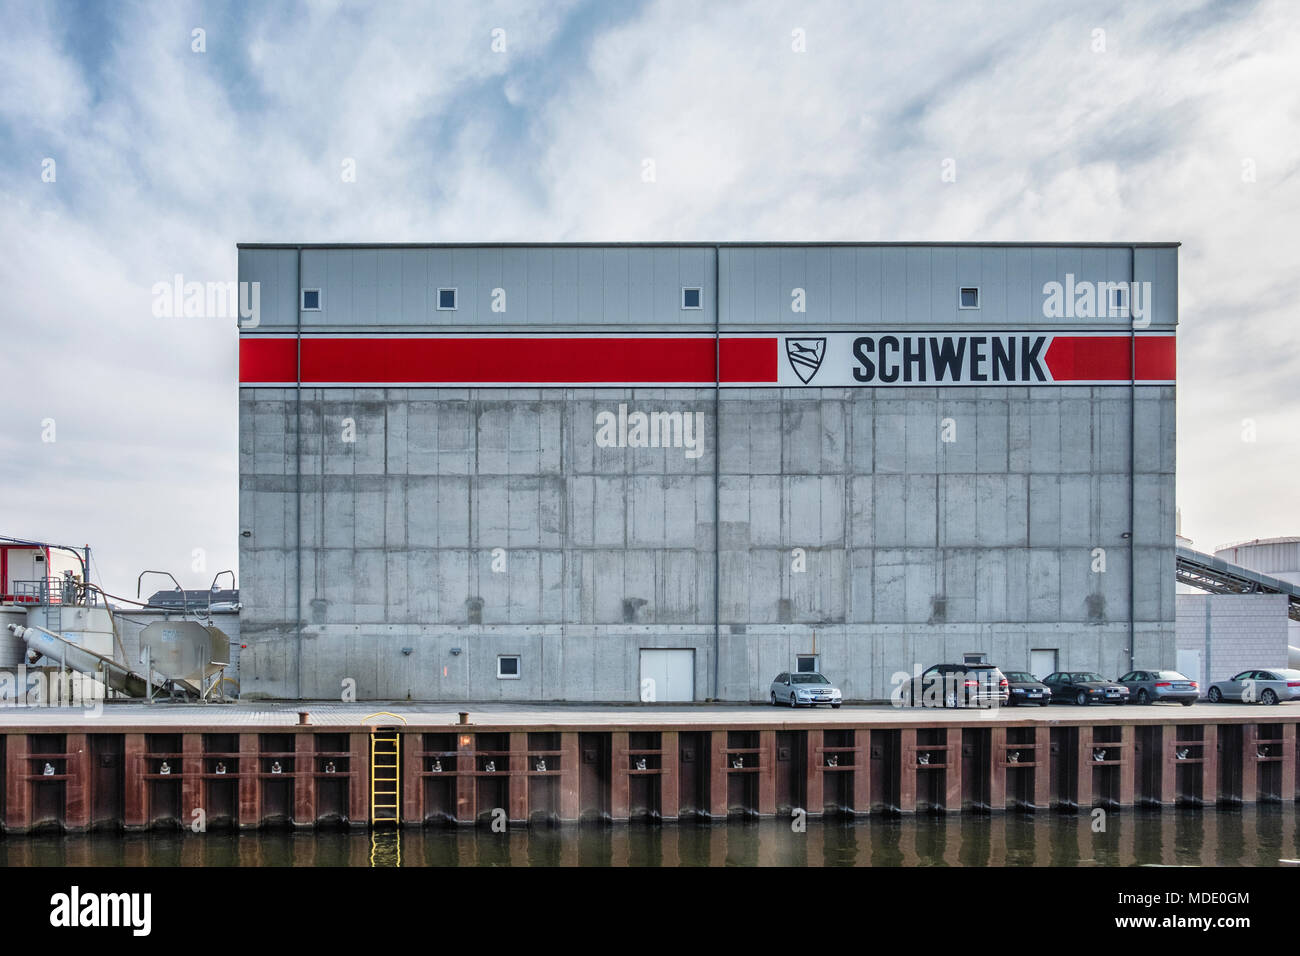 Berlin-Moabit,Westhafen,West Harbour,. SCHWENK German cement manufacturer supplies of cement, concrete, sand & gravel..Warehouse building Stock Photo